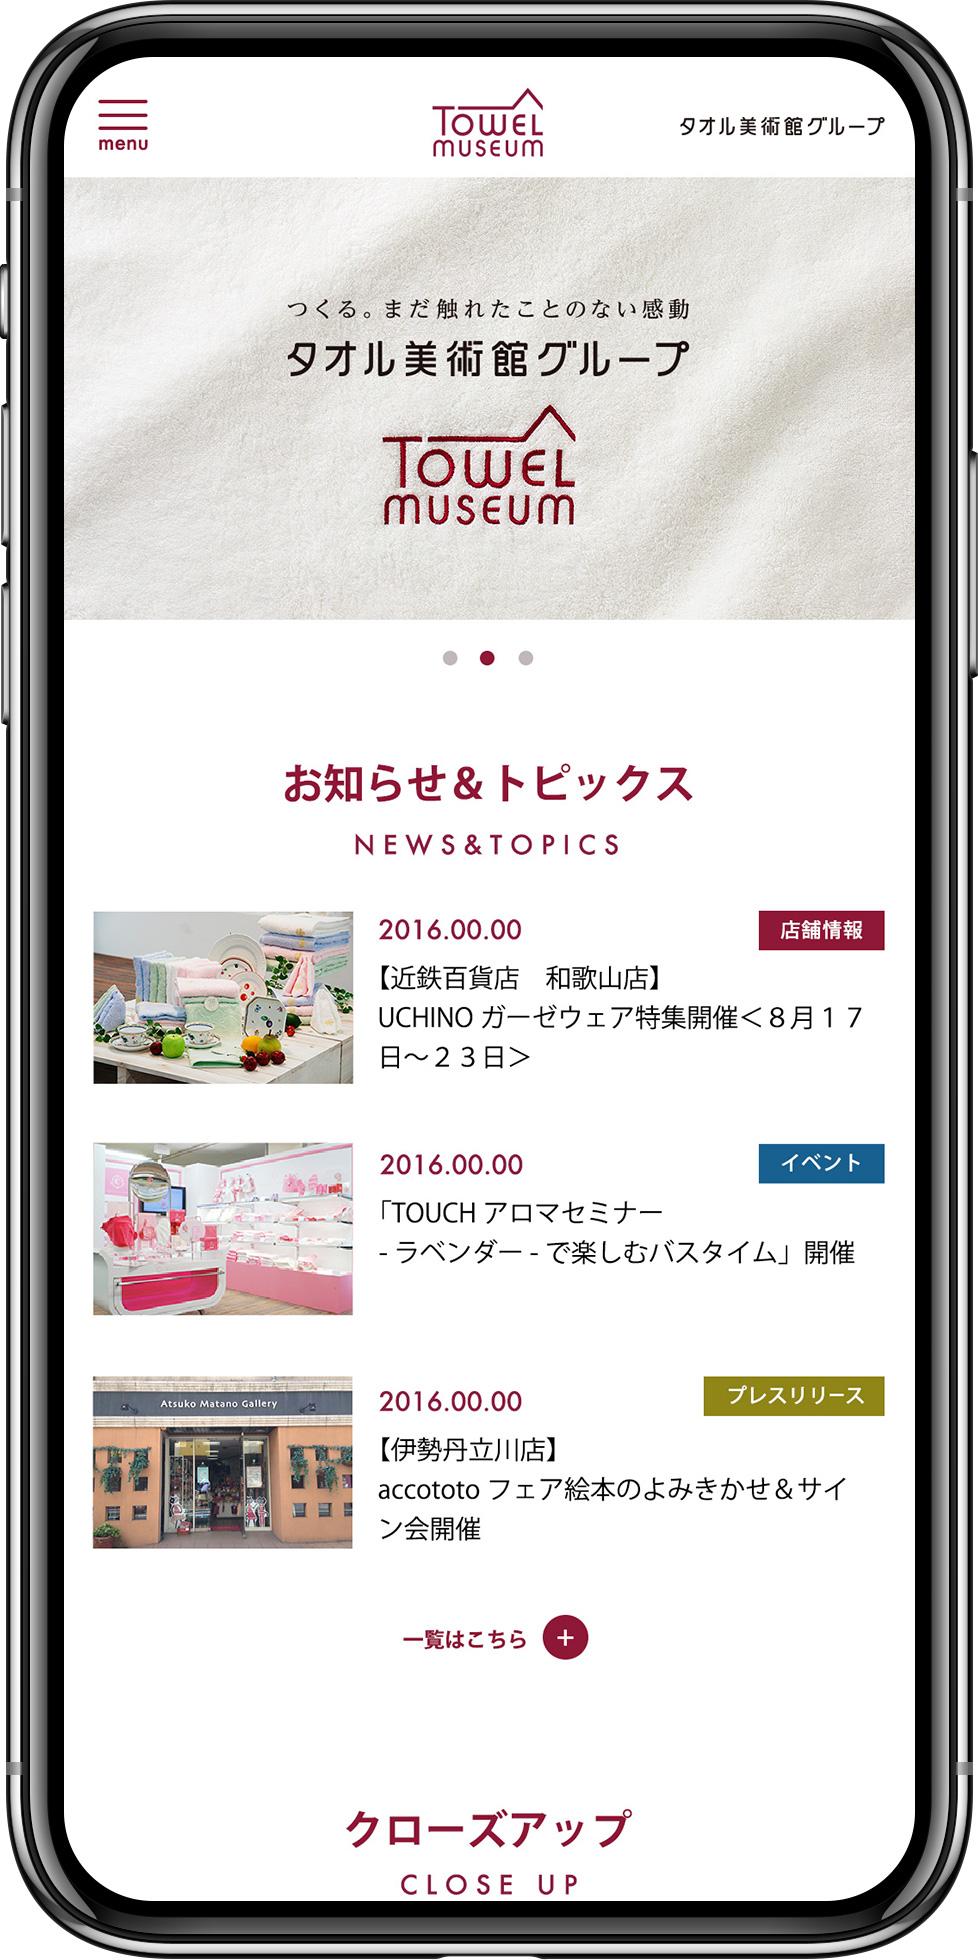 https://artpeace.jp/wp-content/uploads/2018/05/work_tw.png